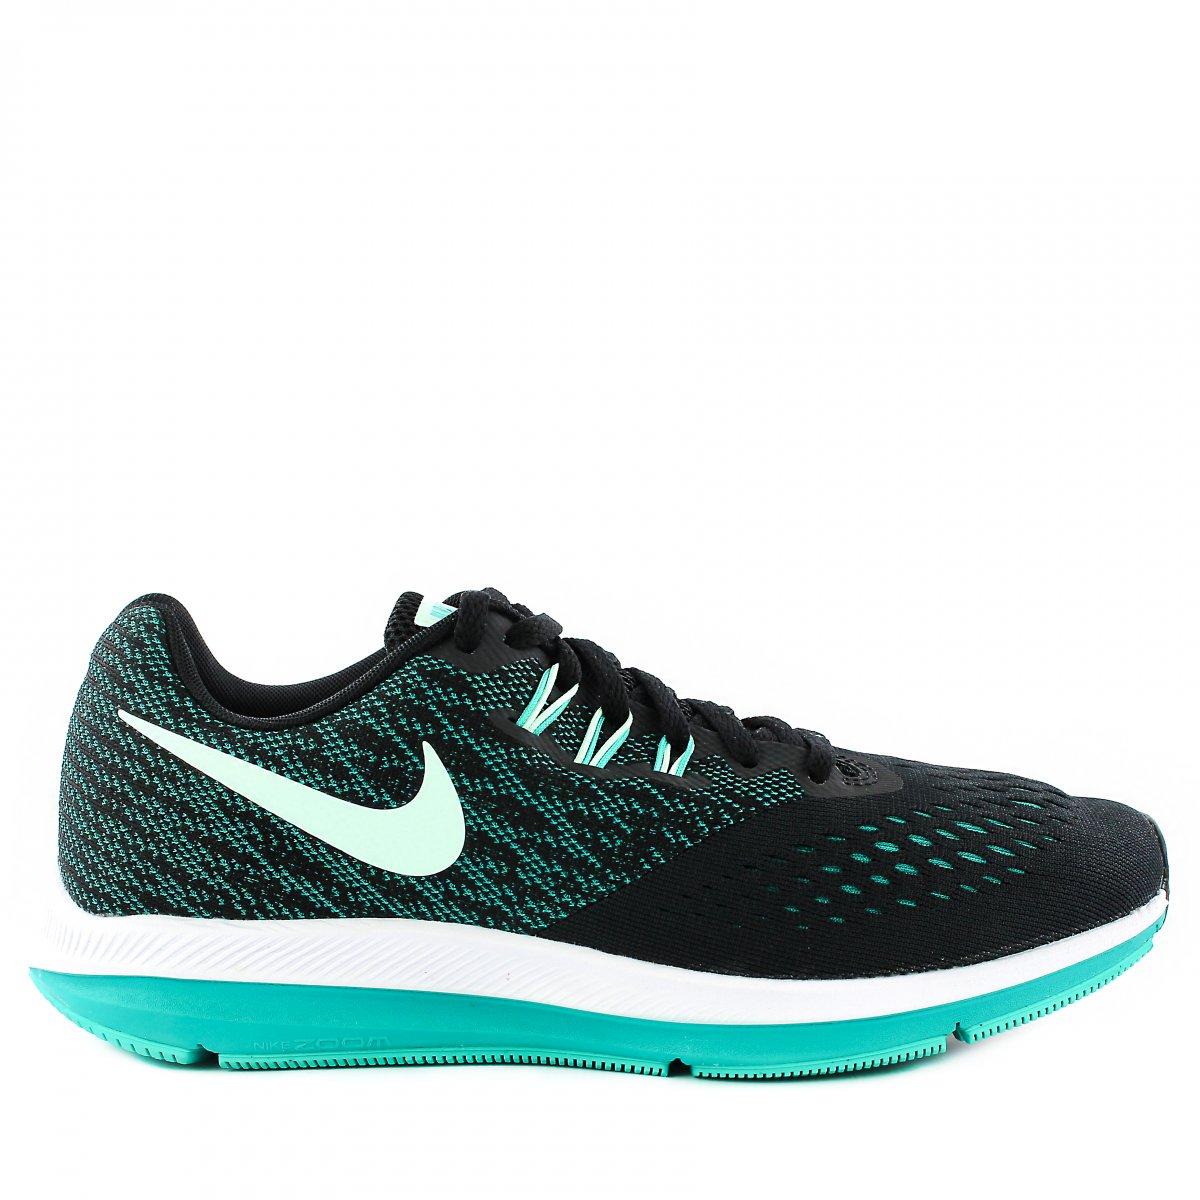 4709a36af5f Tenis Nike Zoom Winflo 4